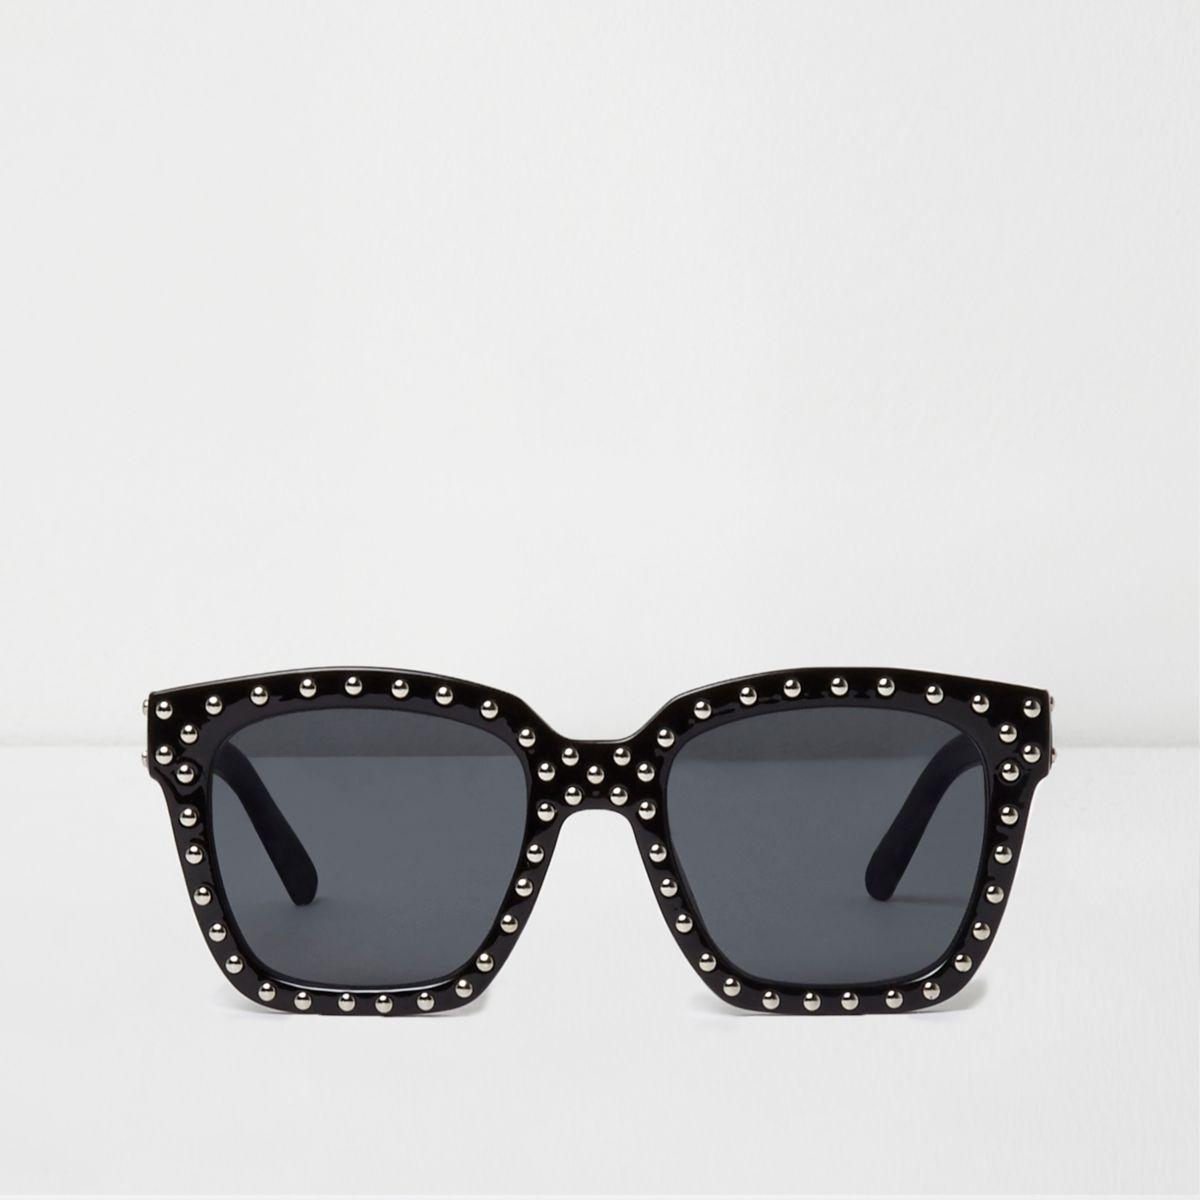 Black studded glam sunglasses